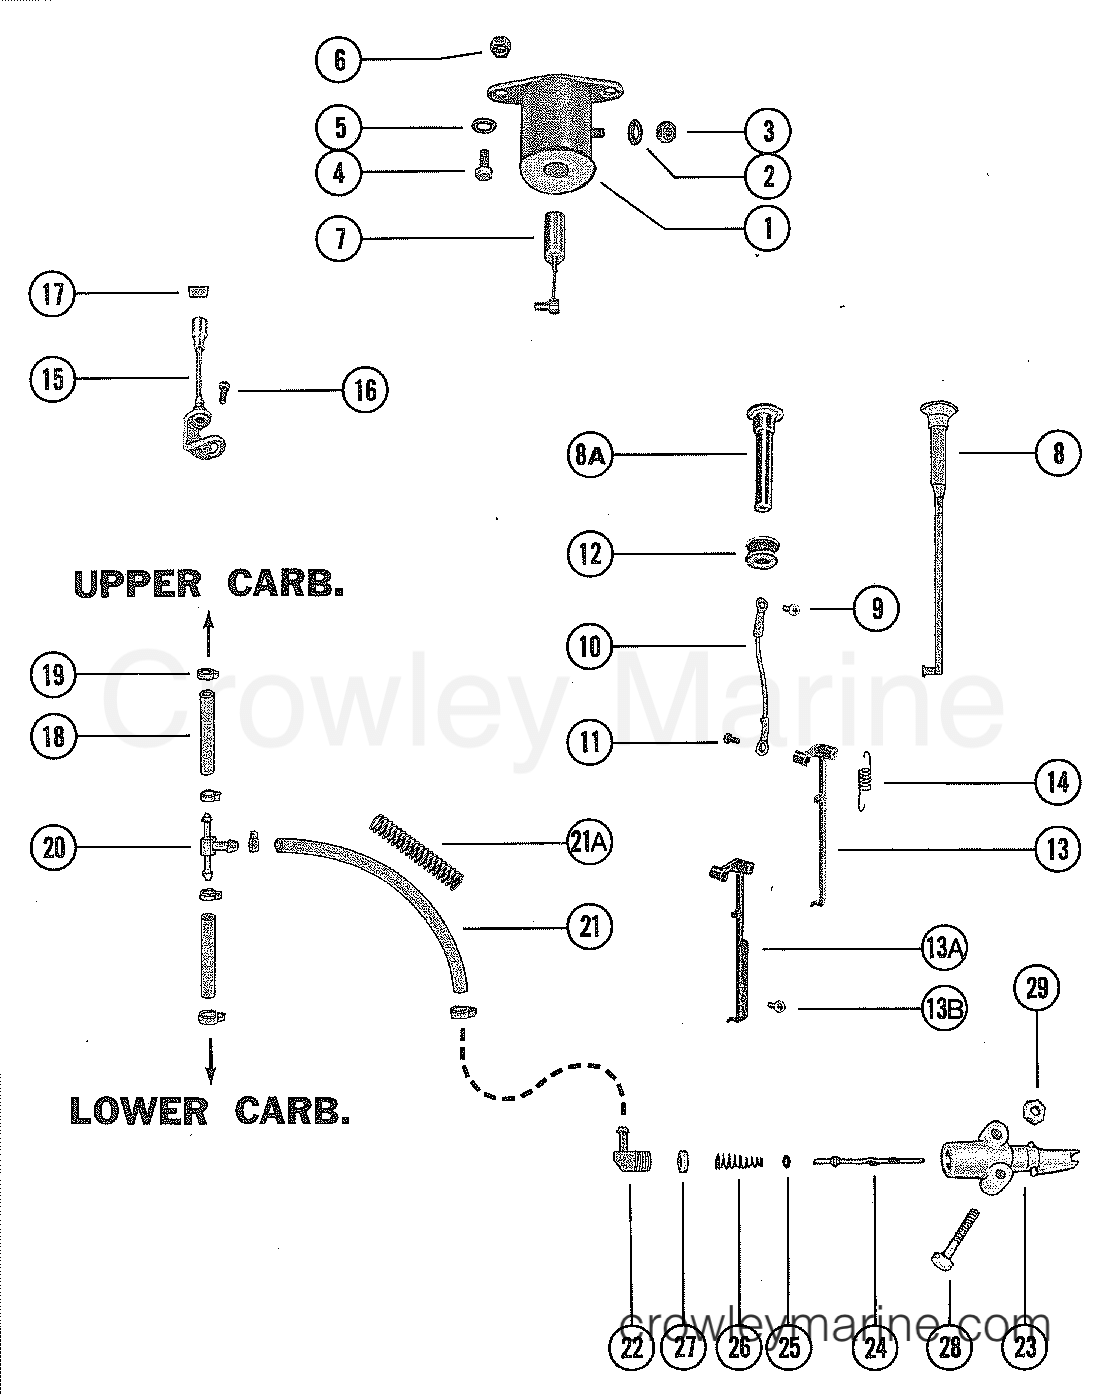 carburetor linkage and choke solenoid - 1976 mercury ... 1976 mercury outboard diagram #13